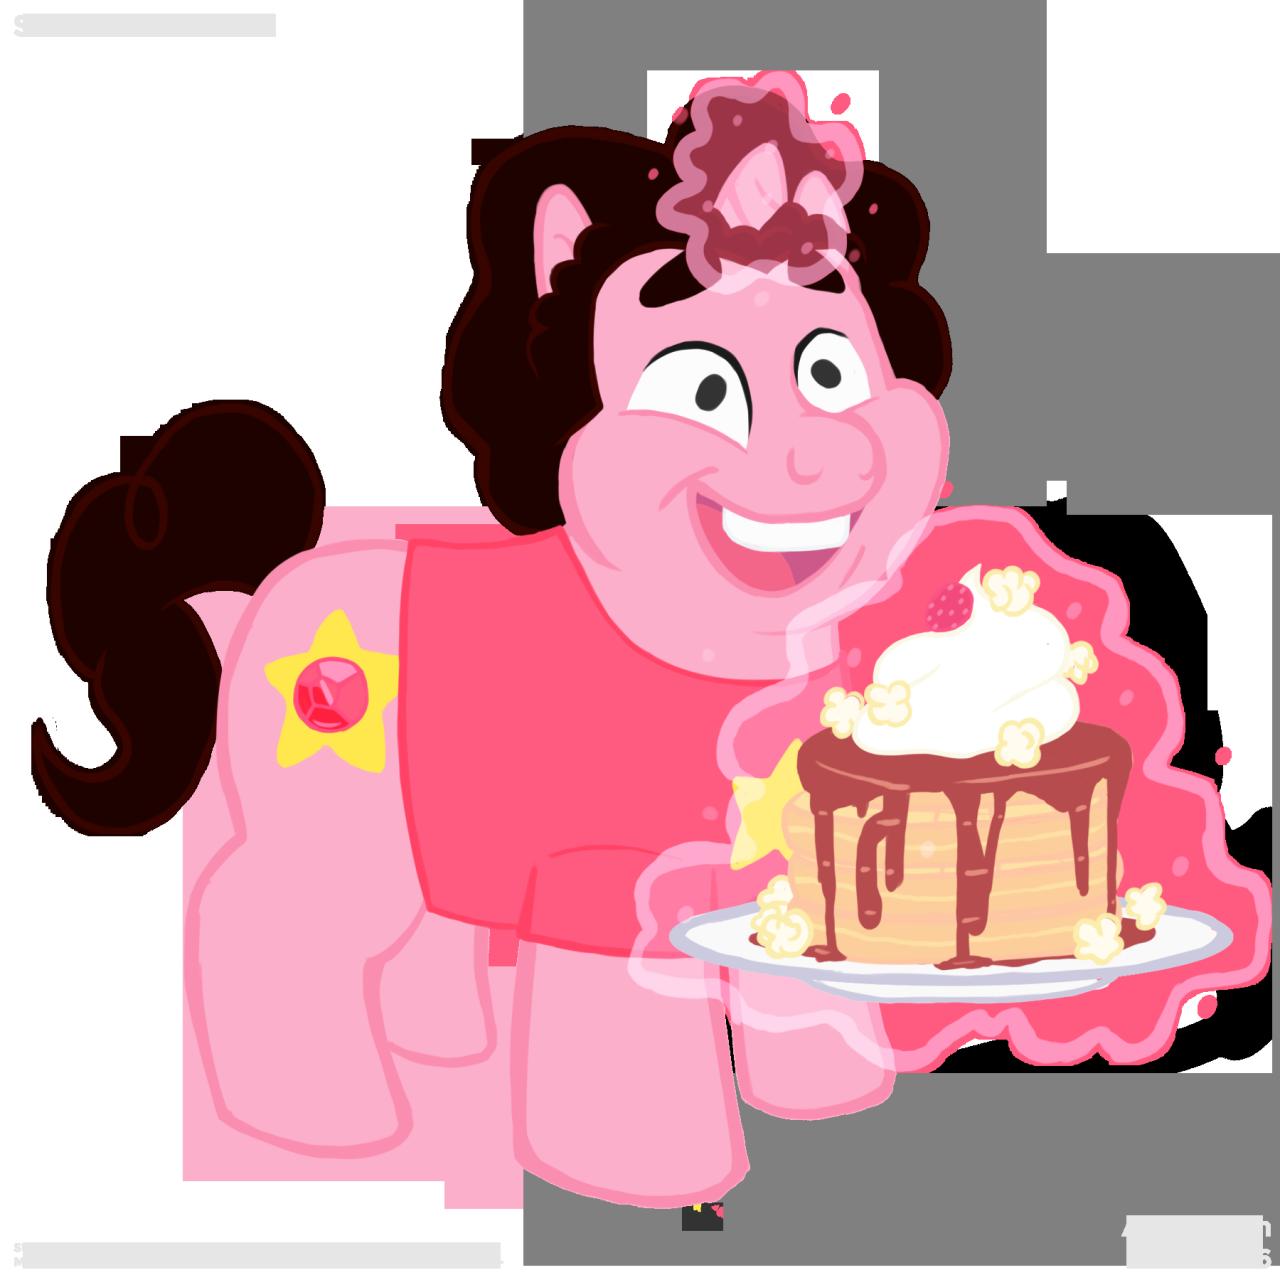 Breakfast pink facial expression mammal vertebrate cartoon nose food fictional character